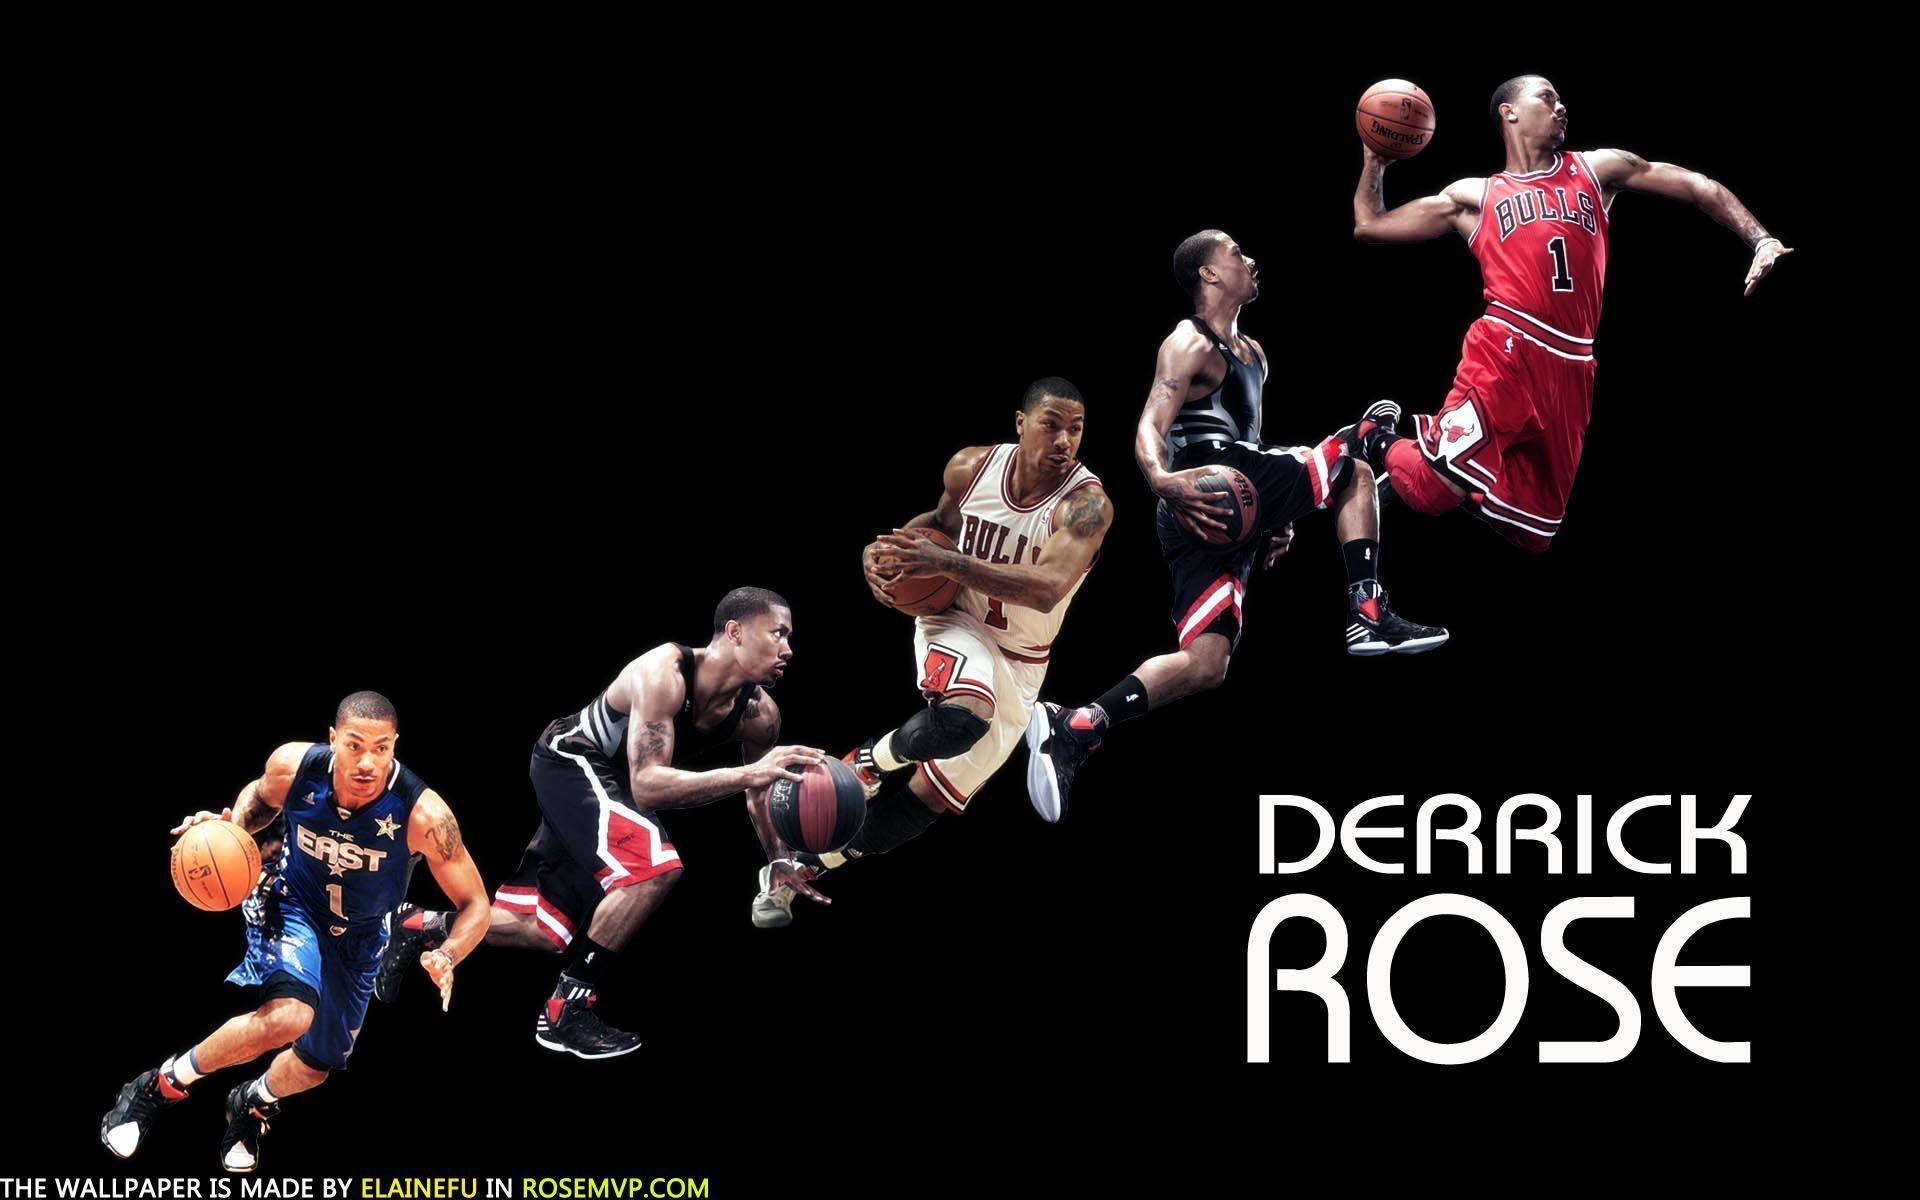 Derrick Rose Dunk Wallpapers Wallpaper Cave Derrick Rose